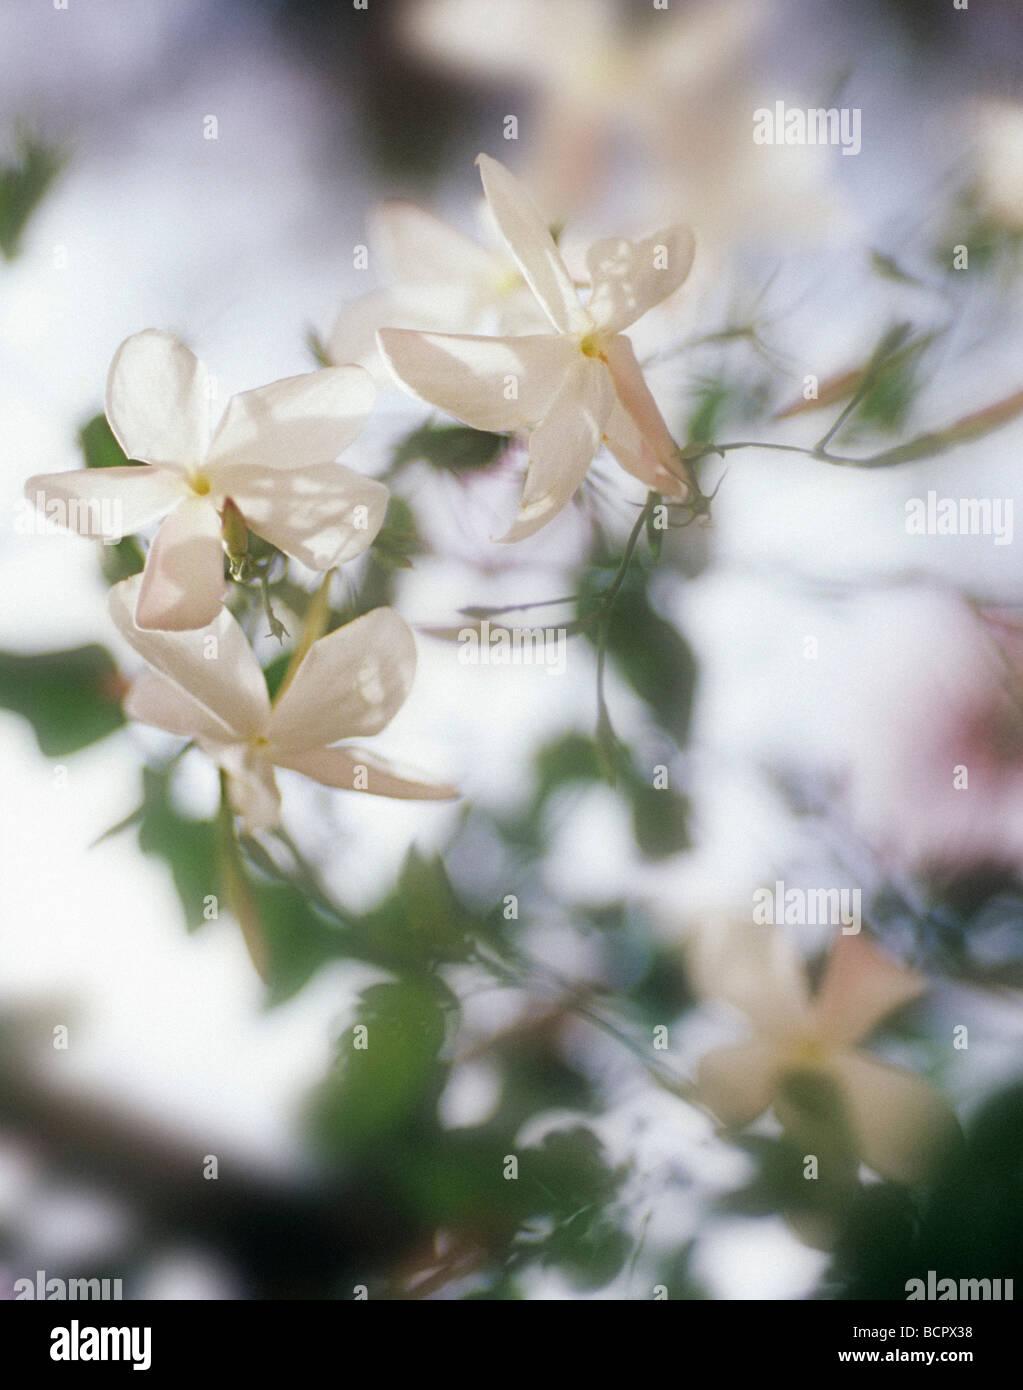 Jasminum officinale jasmine delicate white flowers on the climbing jasminum officinale jasmine delicate white flowers on the climbing plant mightylinksfo Gallery